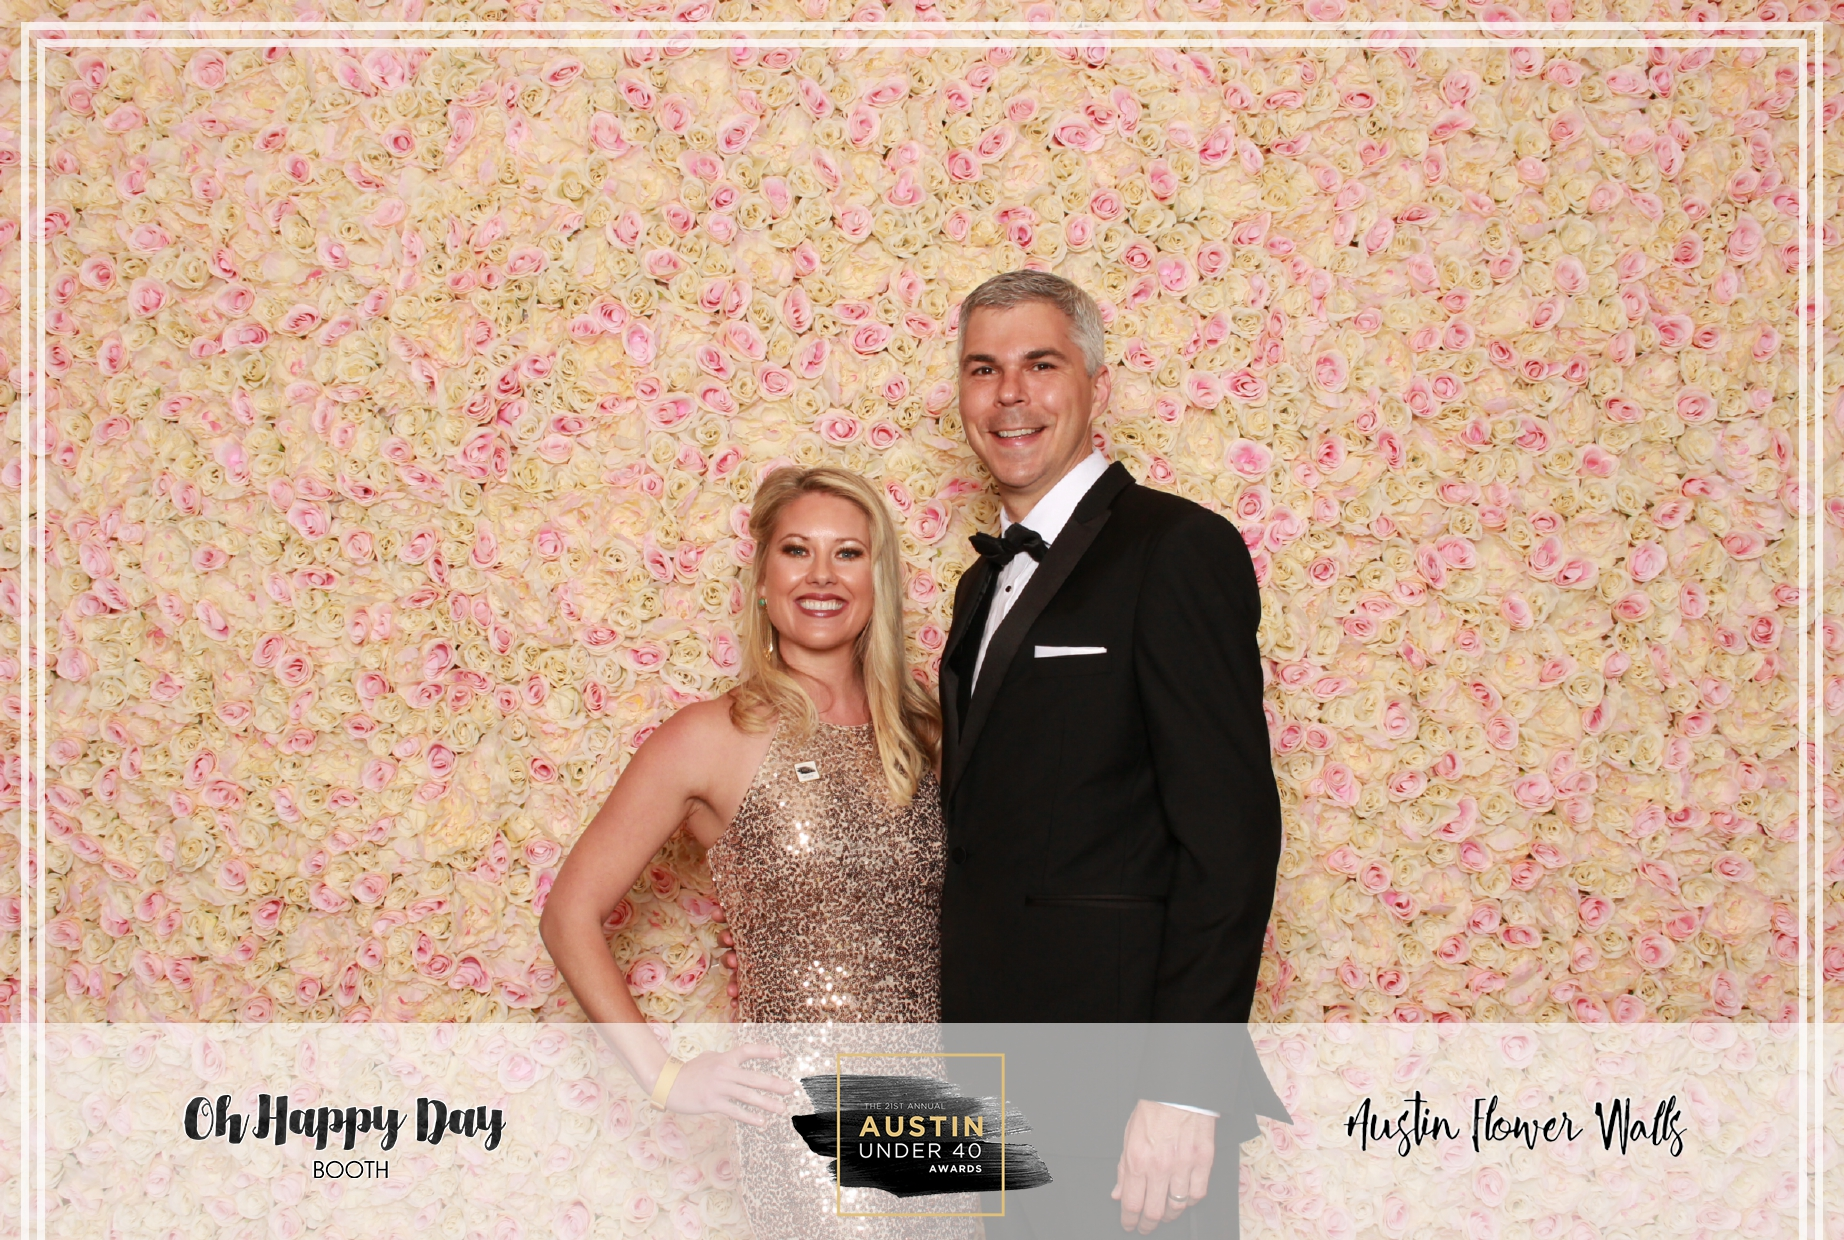 Oh Happy Day Booth - Austin Under 40-35.jpg